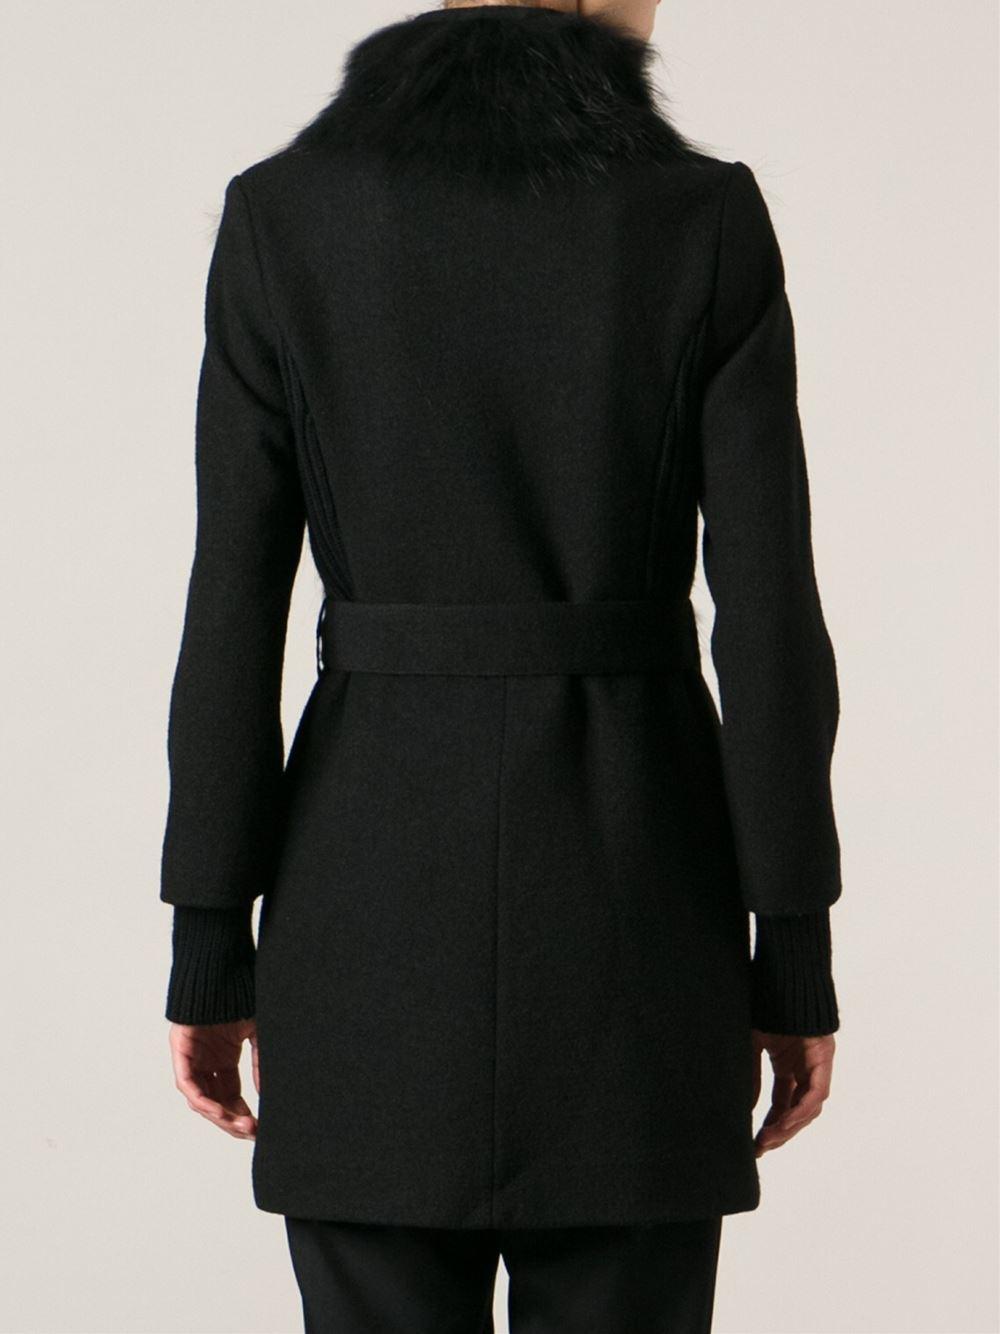 e2ac3057b9 Pinko Fur Neckline Belted Coat in Black - Lyst